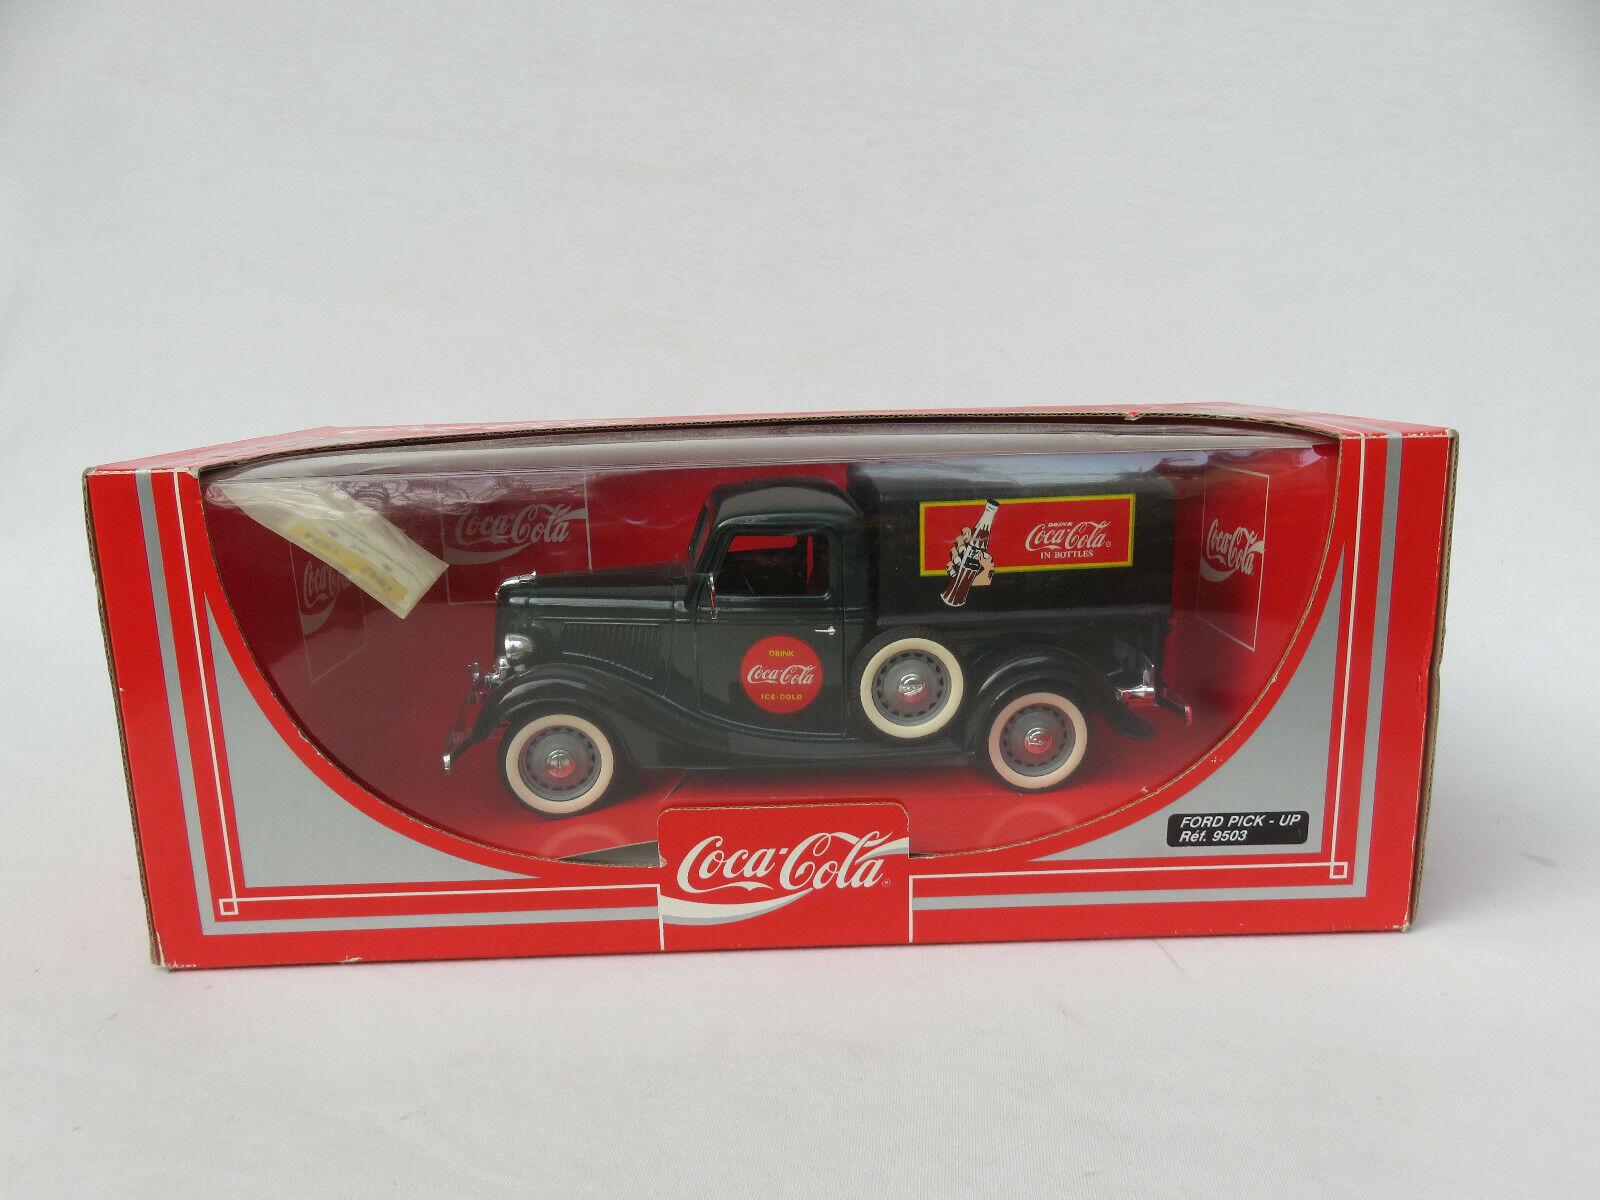 1 18 Ford Pick-Up, Coca-Cola, dunkelgrün schwarz